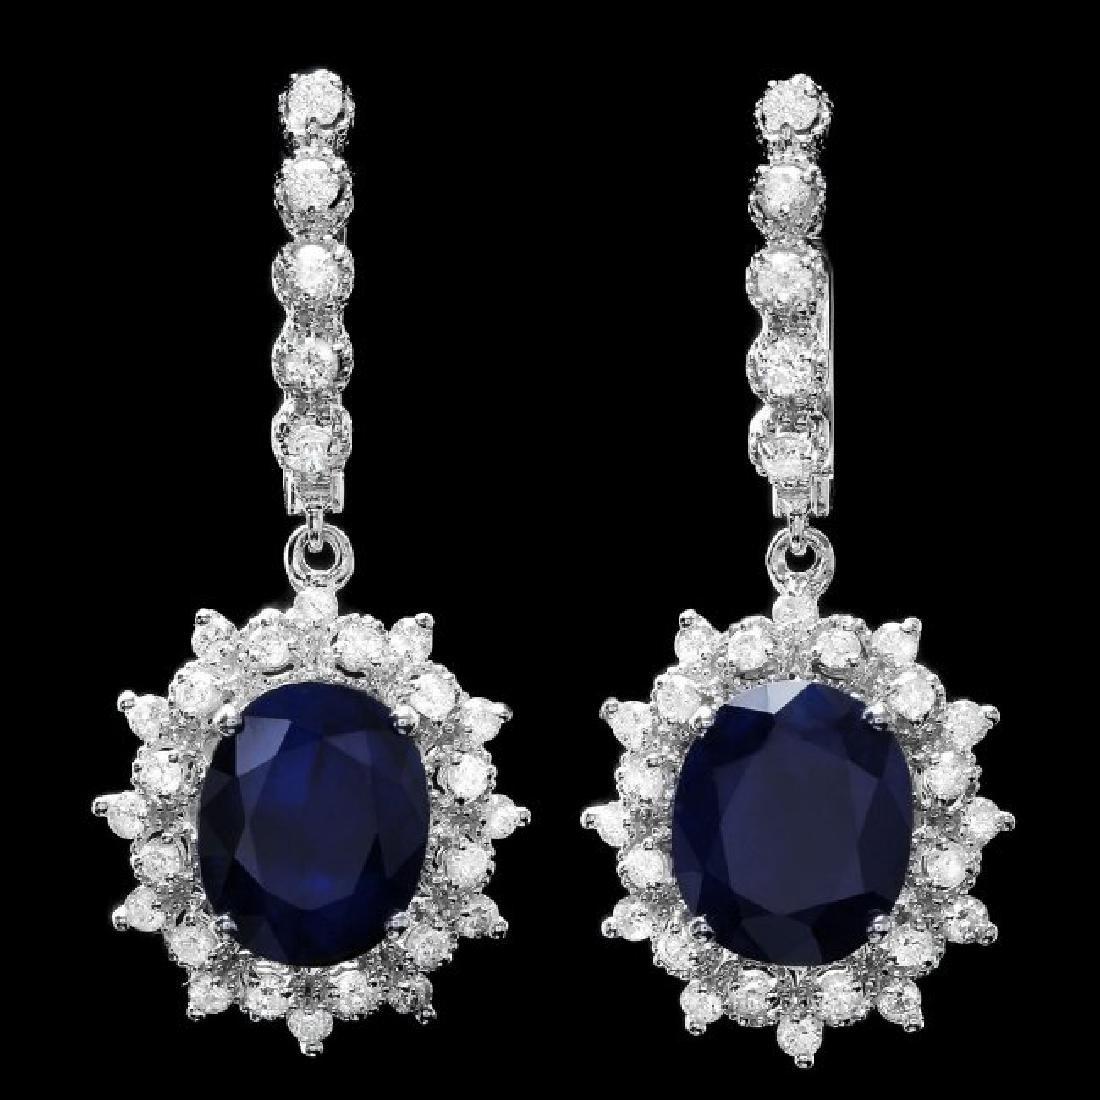 14k Gold 11ct Sapphire 1.60ct Diamond Earrings